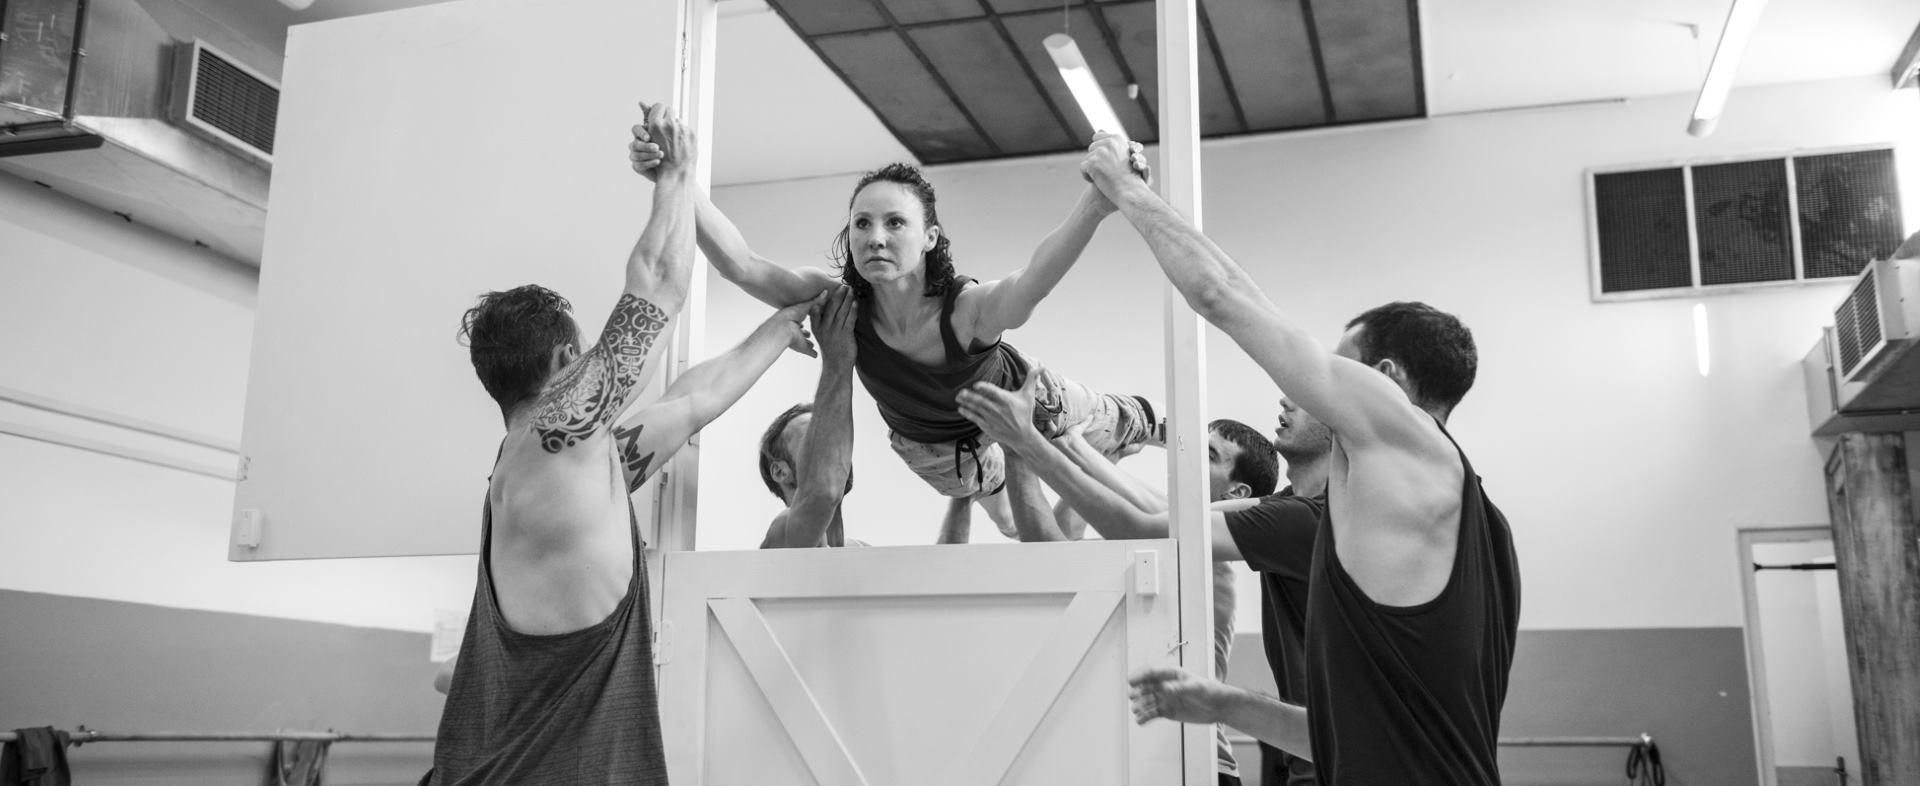 Radna matineja povodom premijere baleta 'Ivica i Marica'